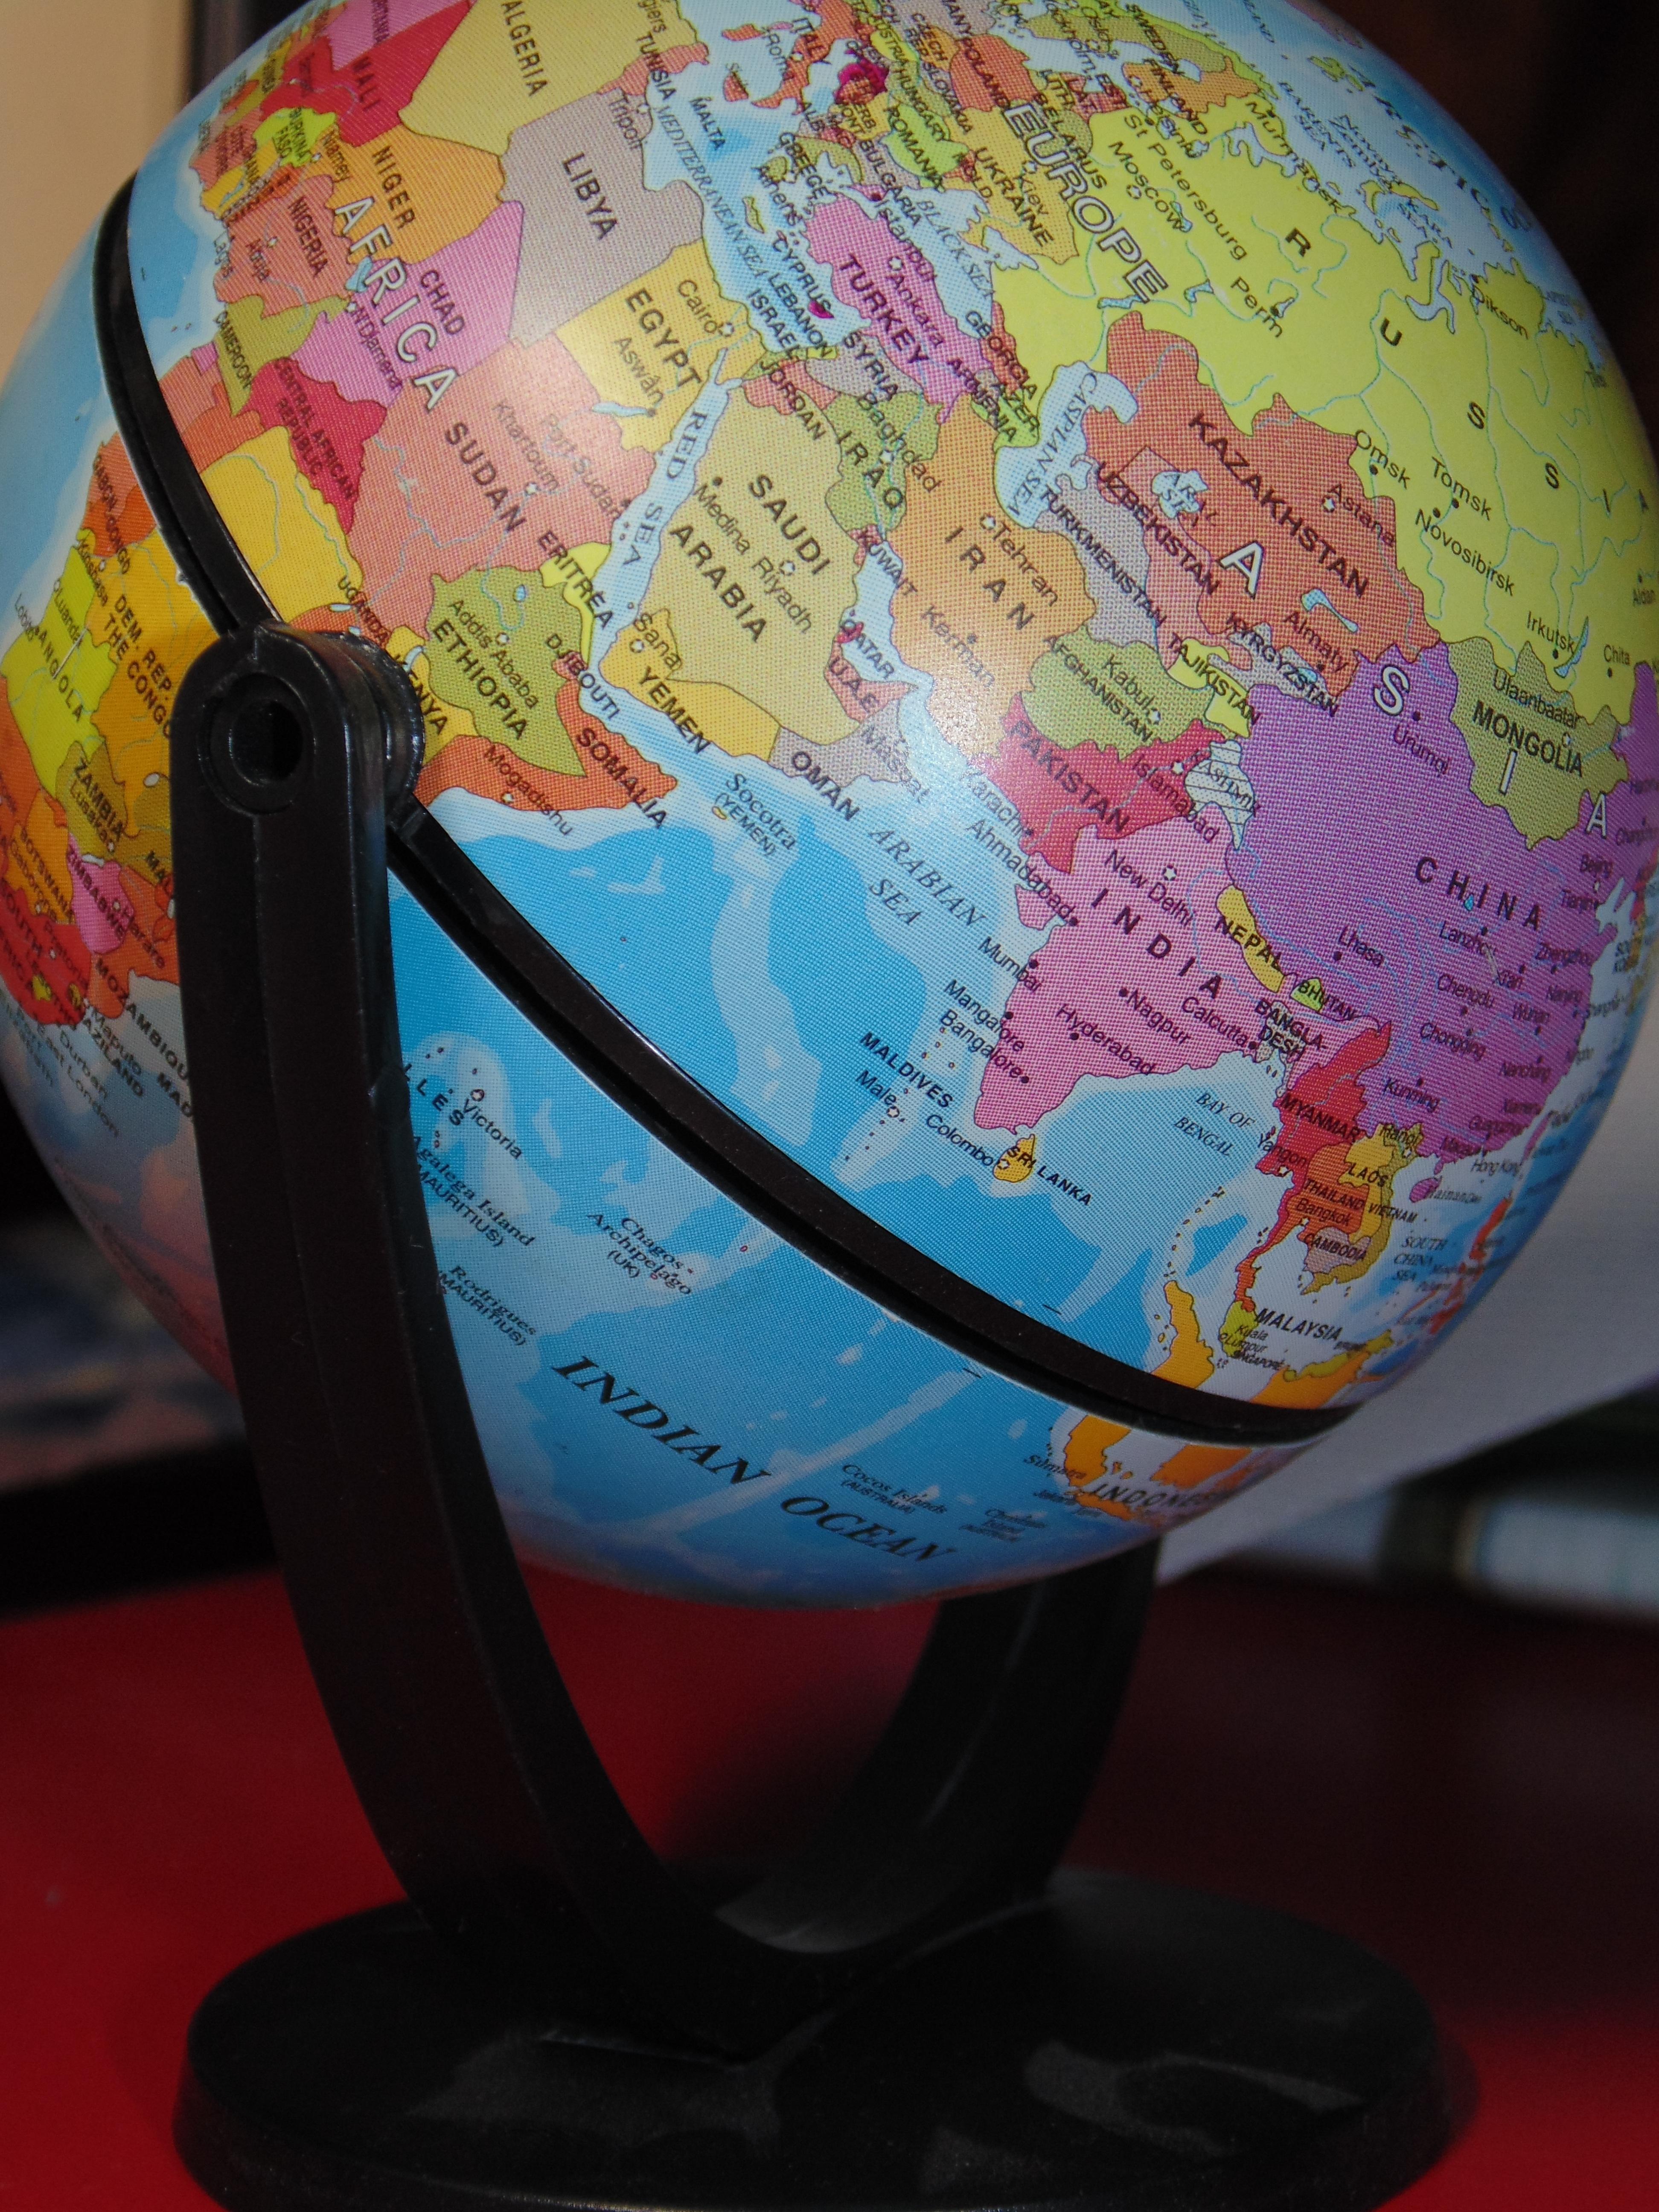 Kostenlose foto : Farbe, blau, Kreis, Globus, Welt, Erdkunde ...